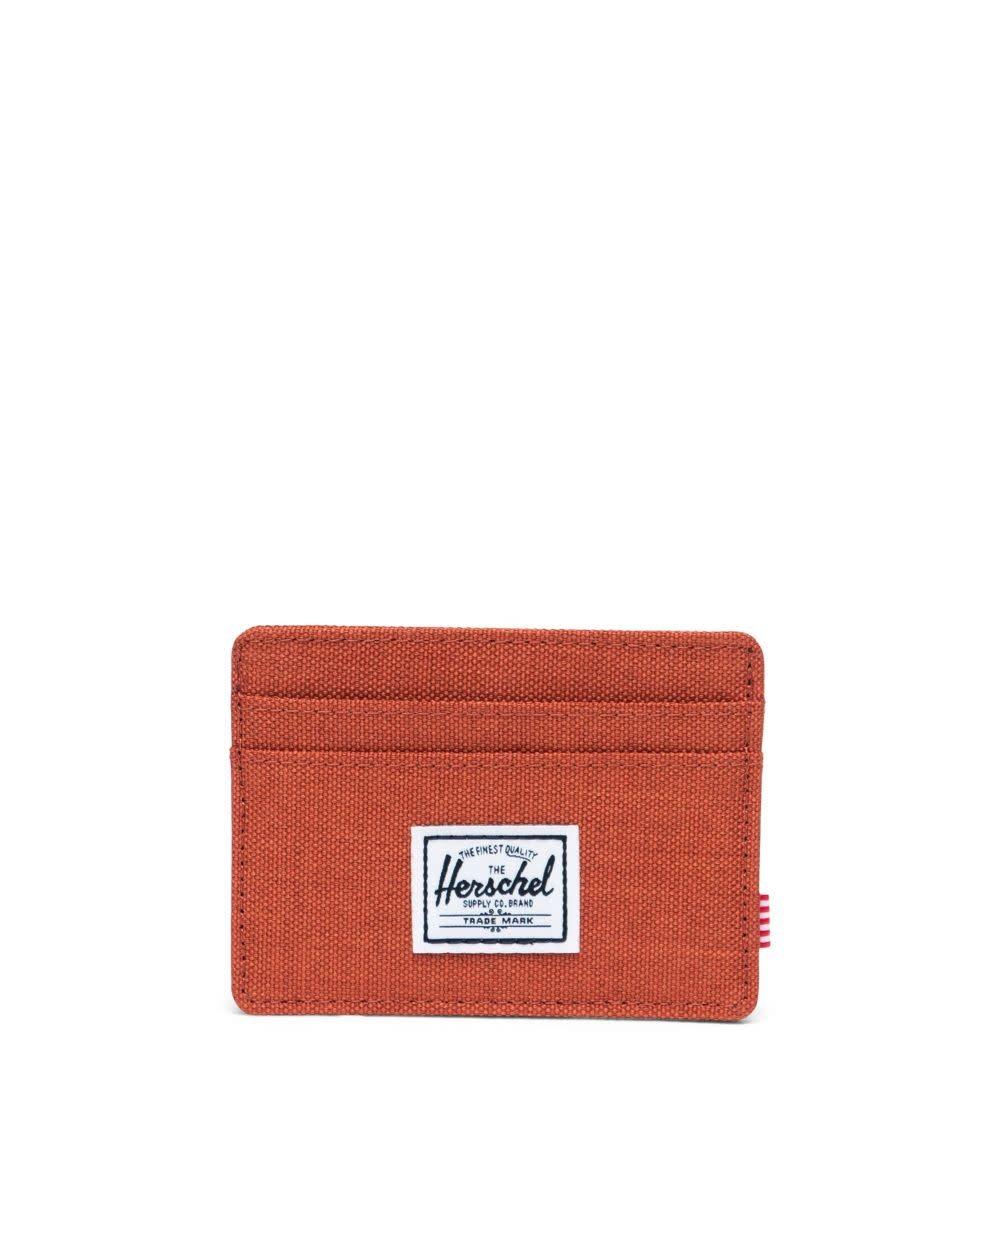 Herschel Supply Co. Herschel Charlie Wallet - Picante Crosshatch